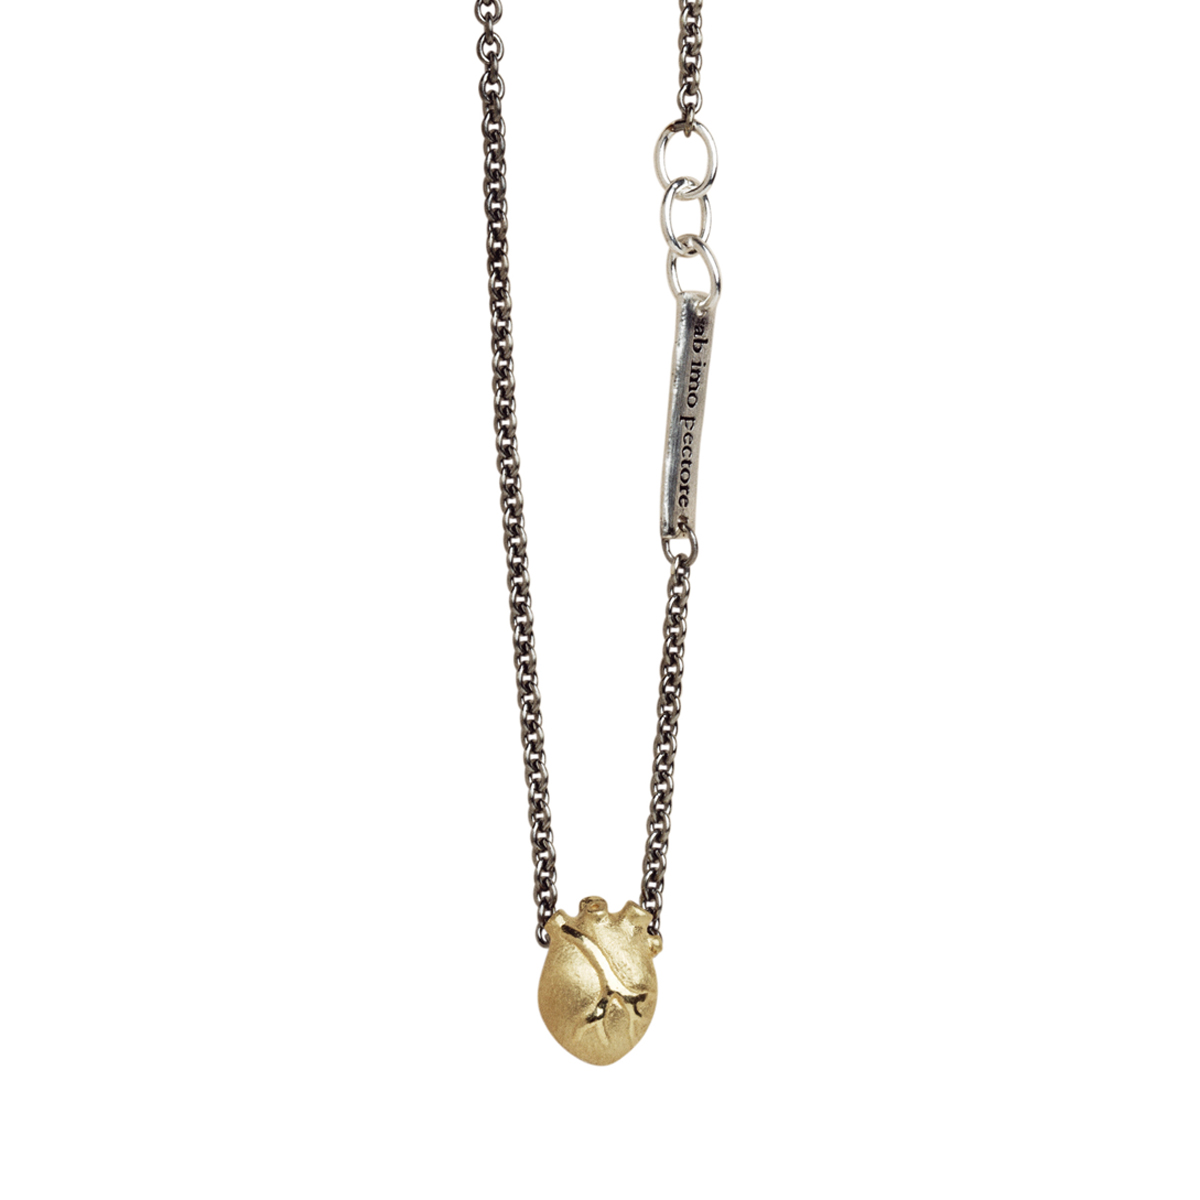 BJÖRG halsband - anatomiskt hjärta 5a421b743d8b2